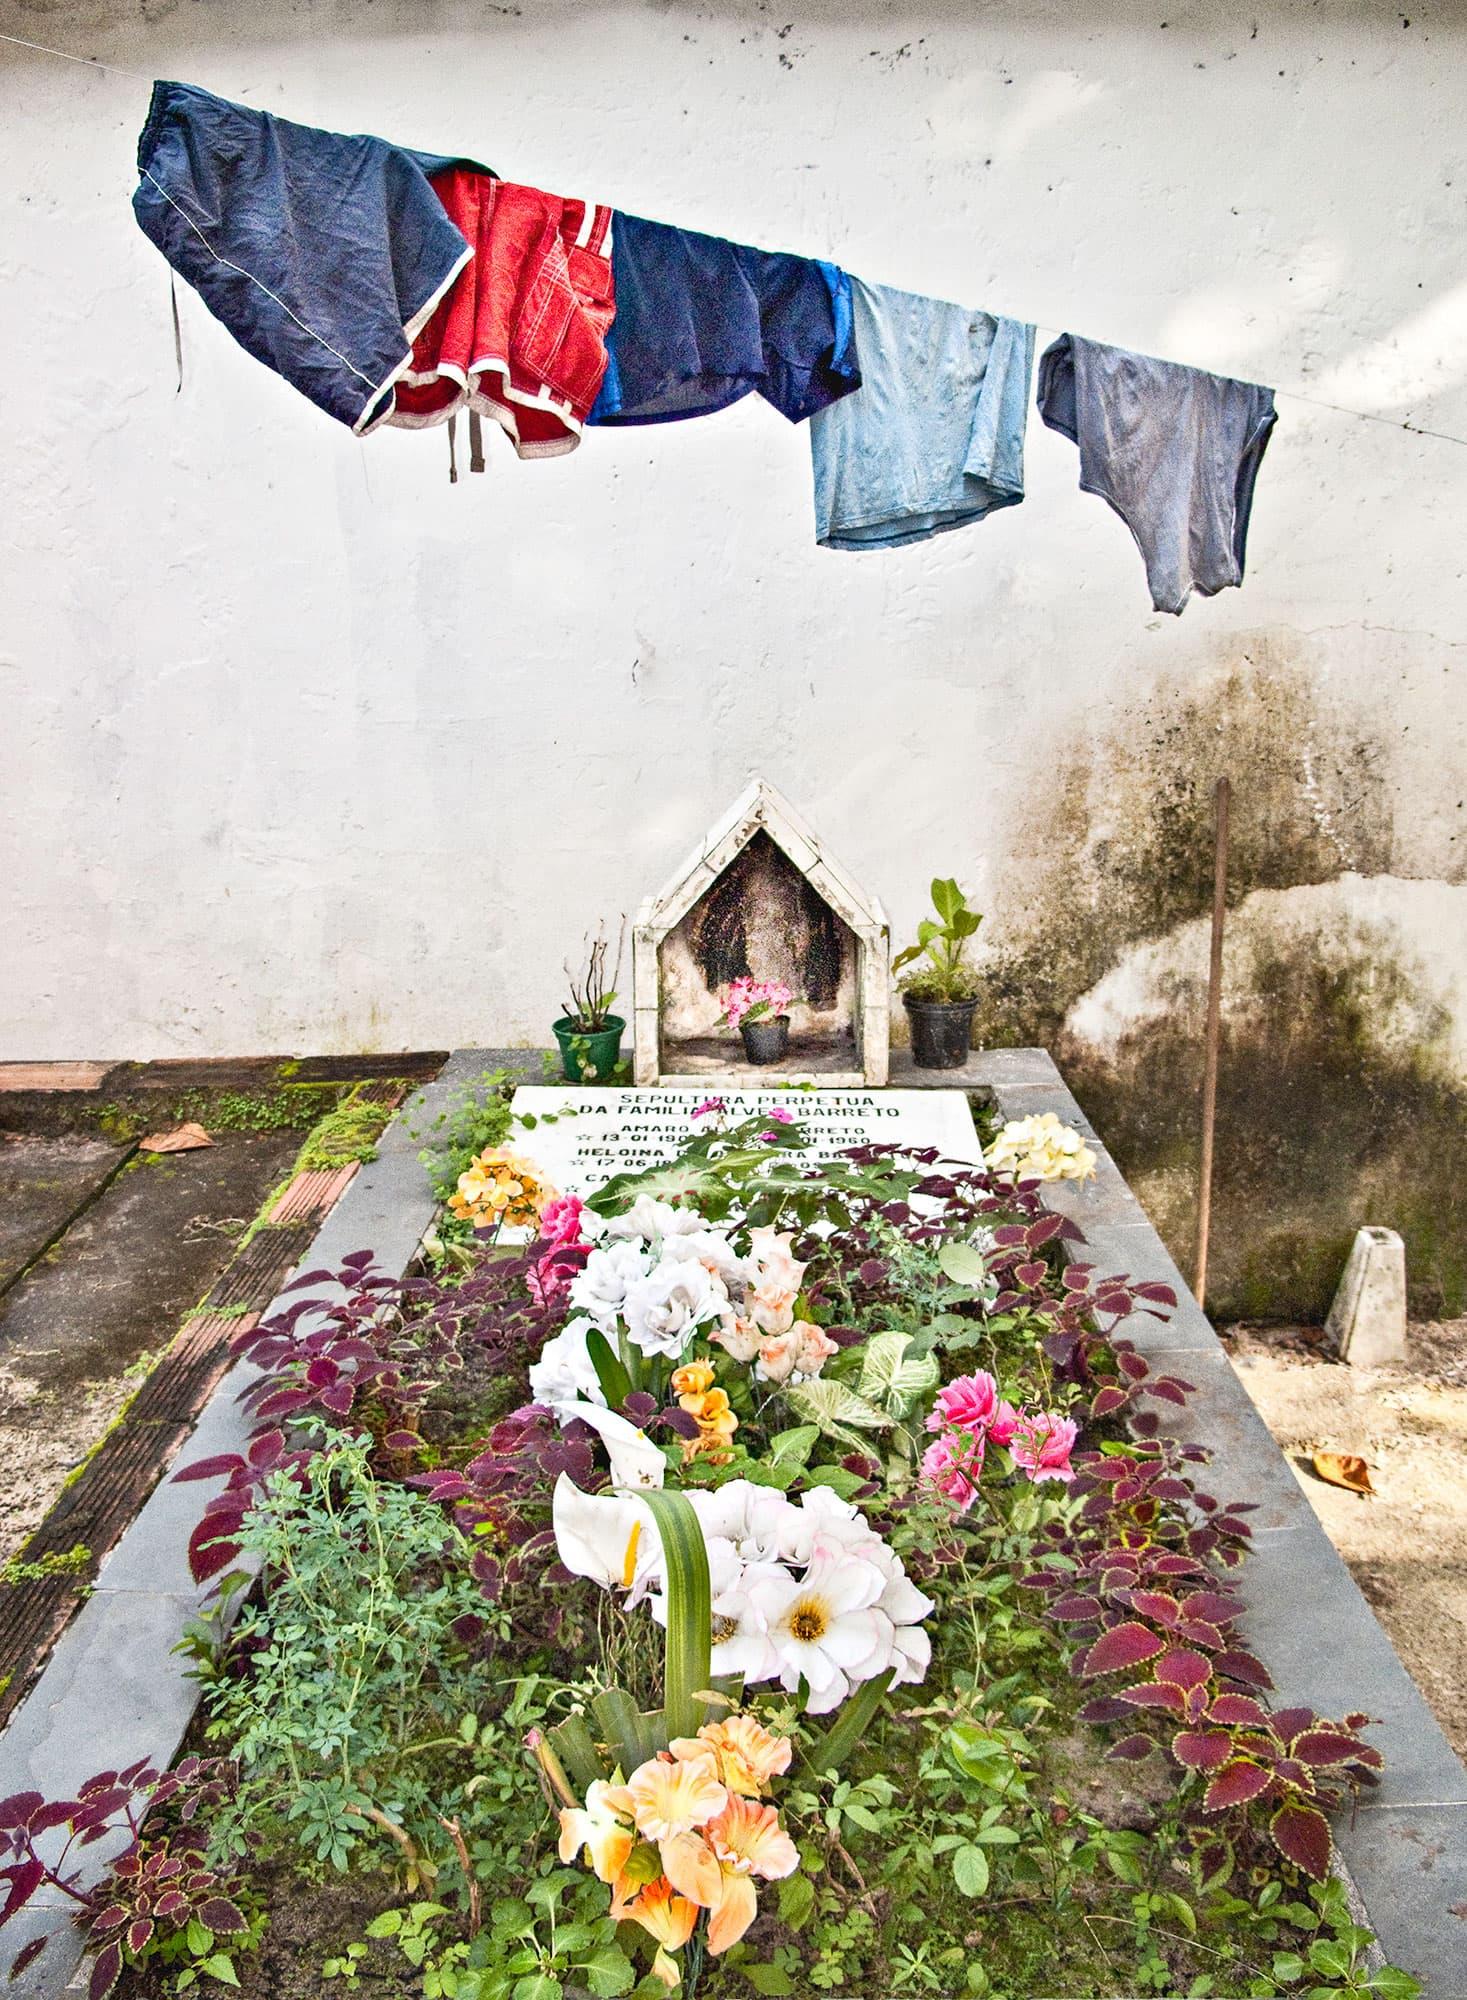 arthur-lazar-Niteroi-Cemetery-2011